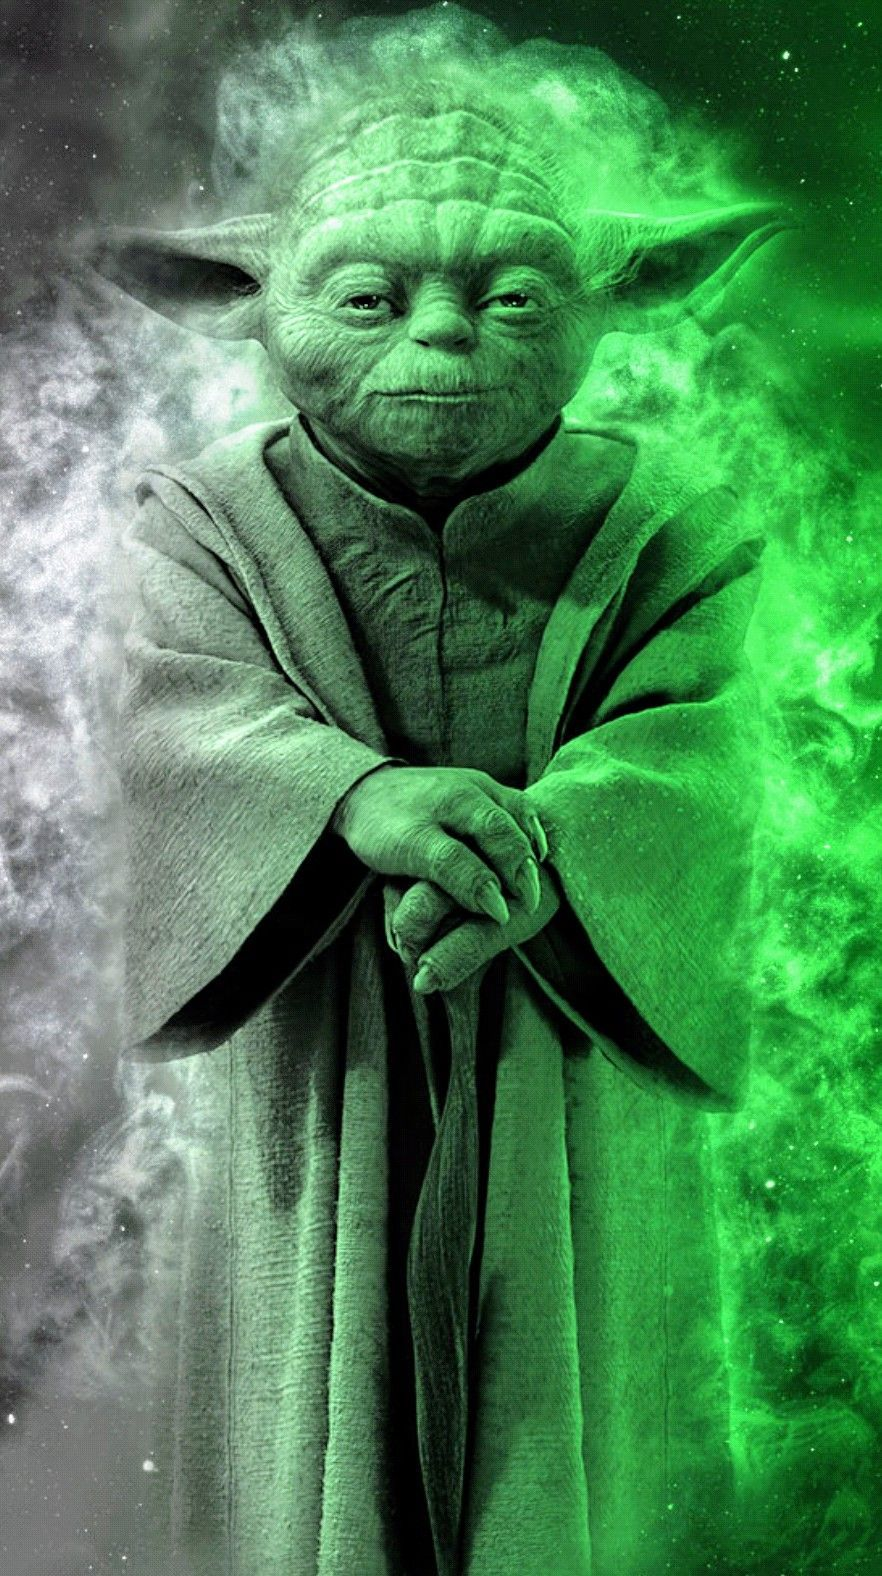 Cool Yoda Wallpapers Top Free Cool Yoda Backgrounds Wallpaperaccess